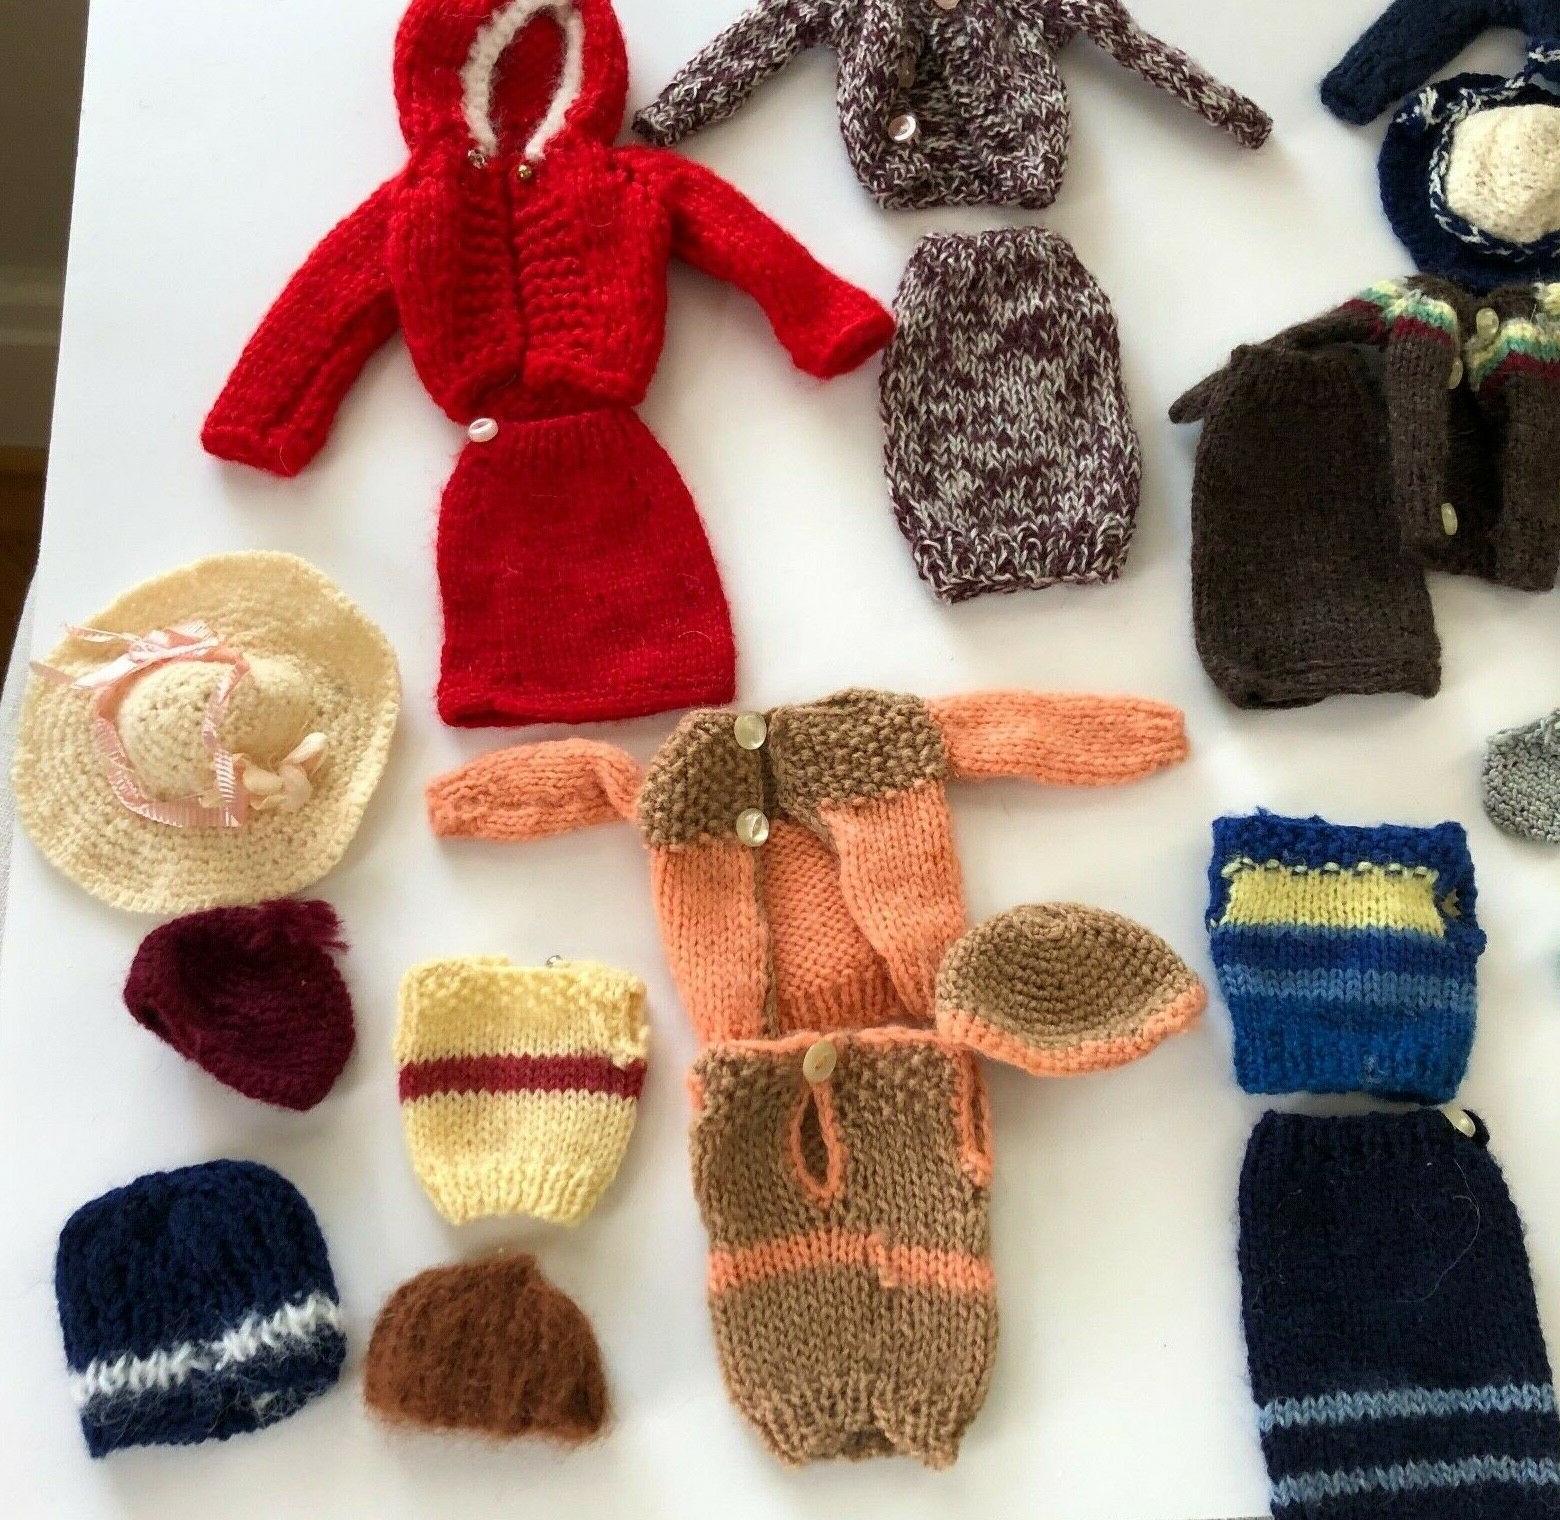 skirt & sWeater sets, 7 crocheted